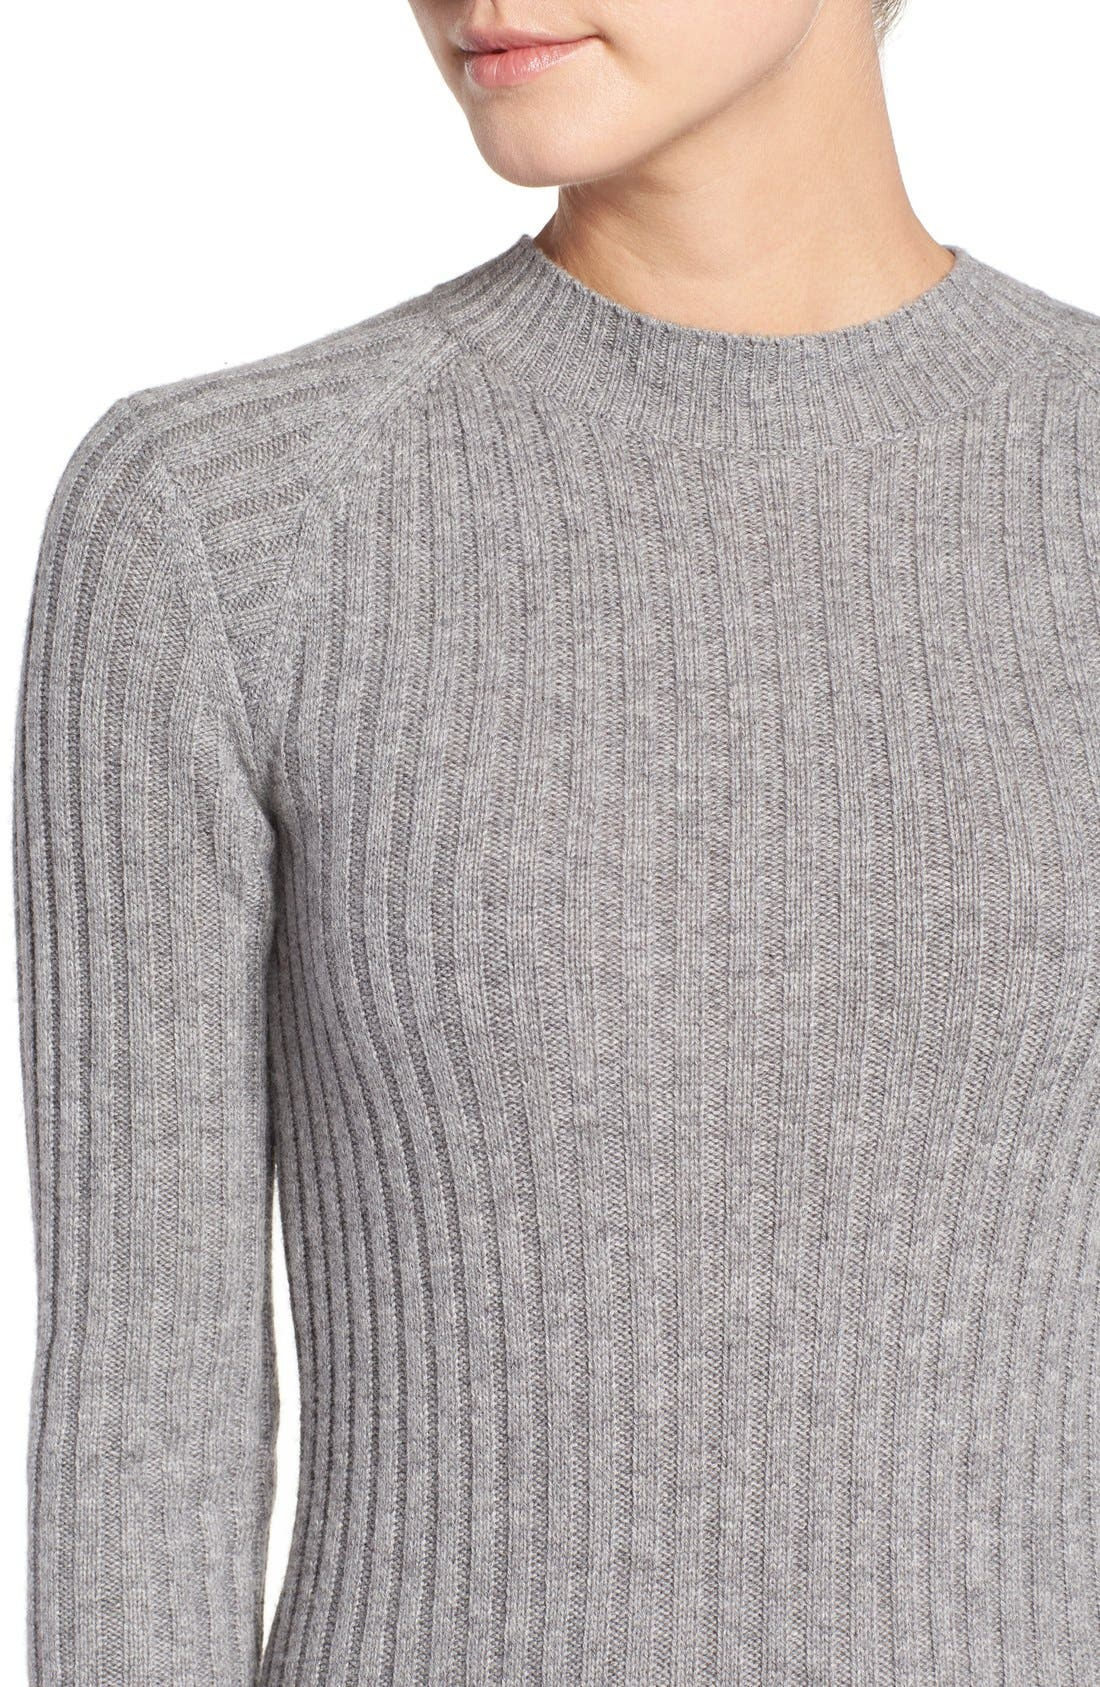 Reign Merino Wool & Cashmere Sweater Midi Dress,                             Alternate thumbnail 4, color,                             Medium Heather Grey